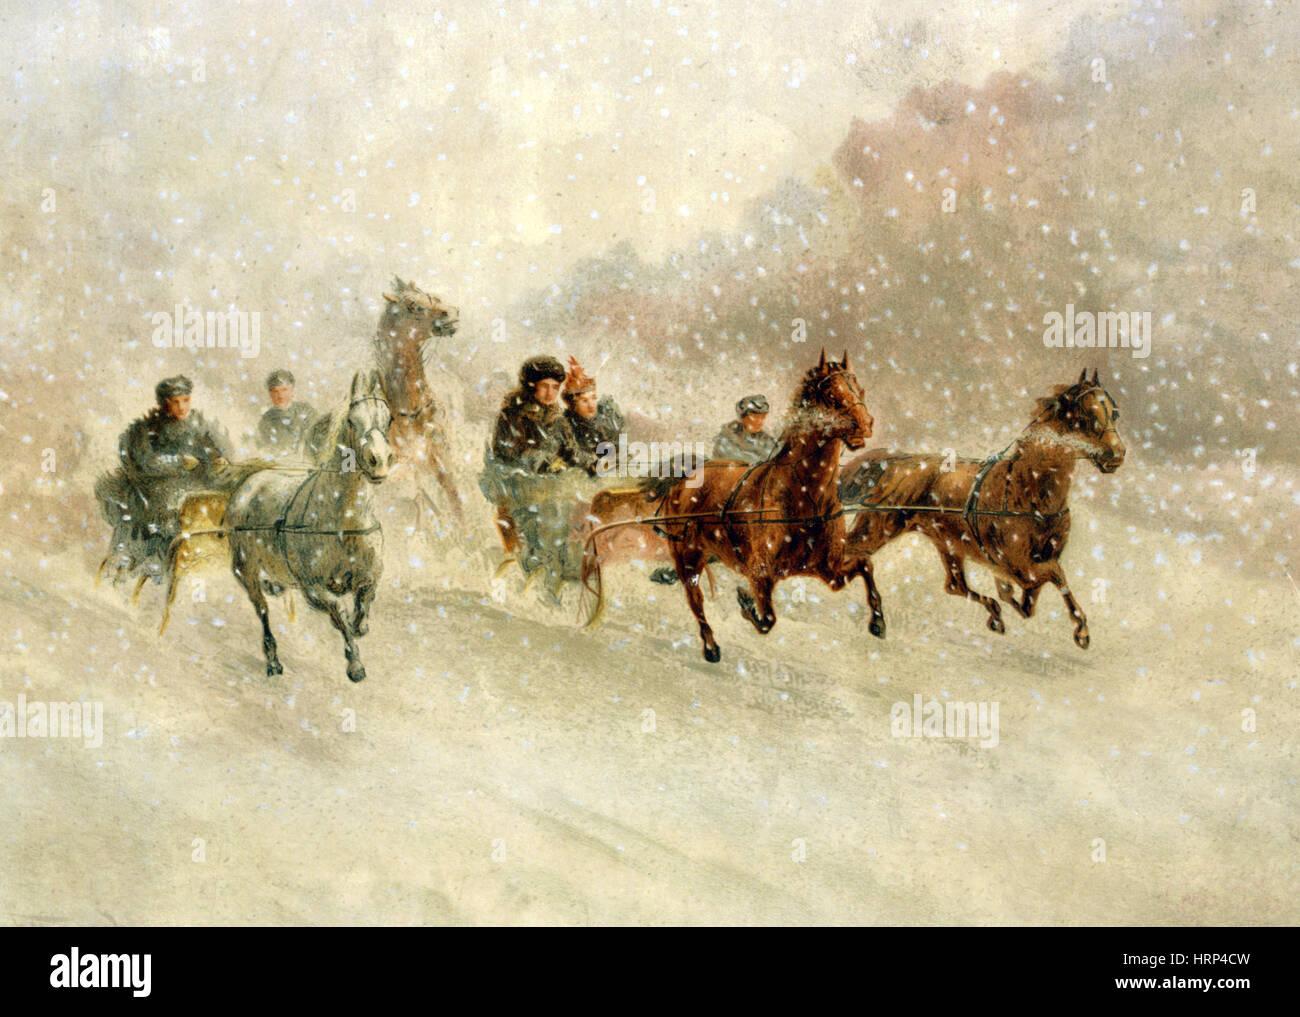 Season's Greetings, Happy Holidays, 1894 - Stock Image